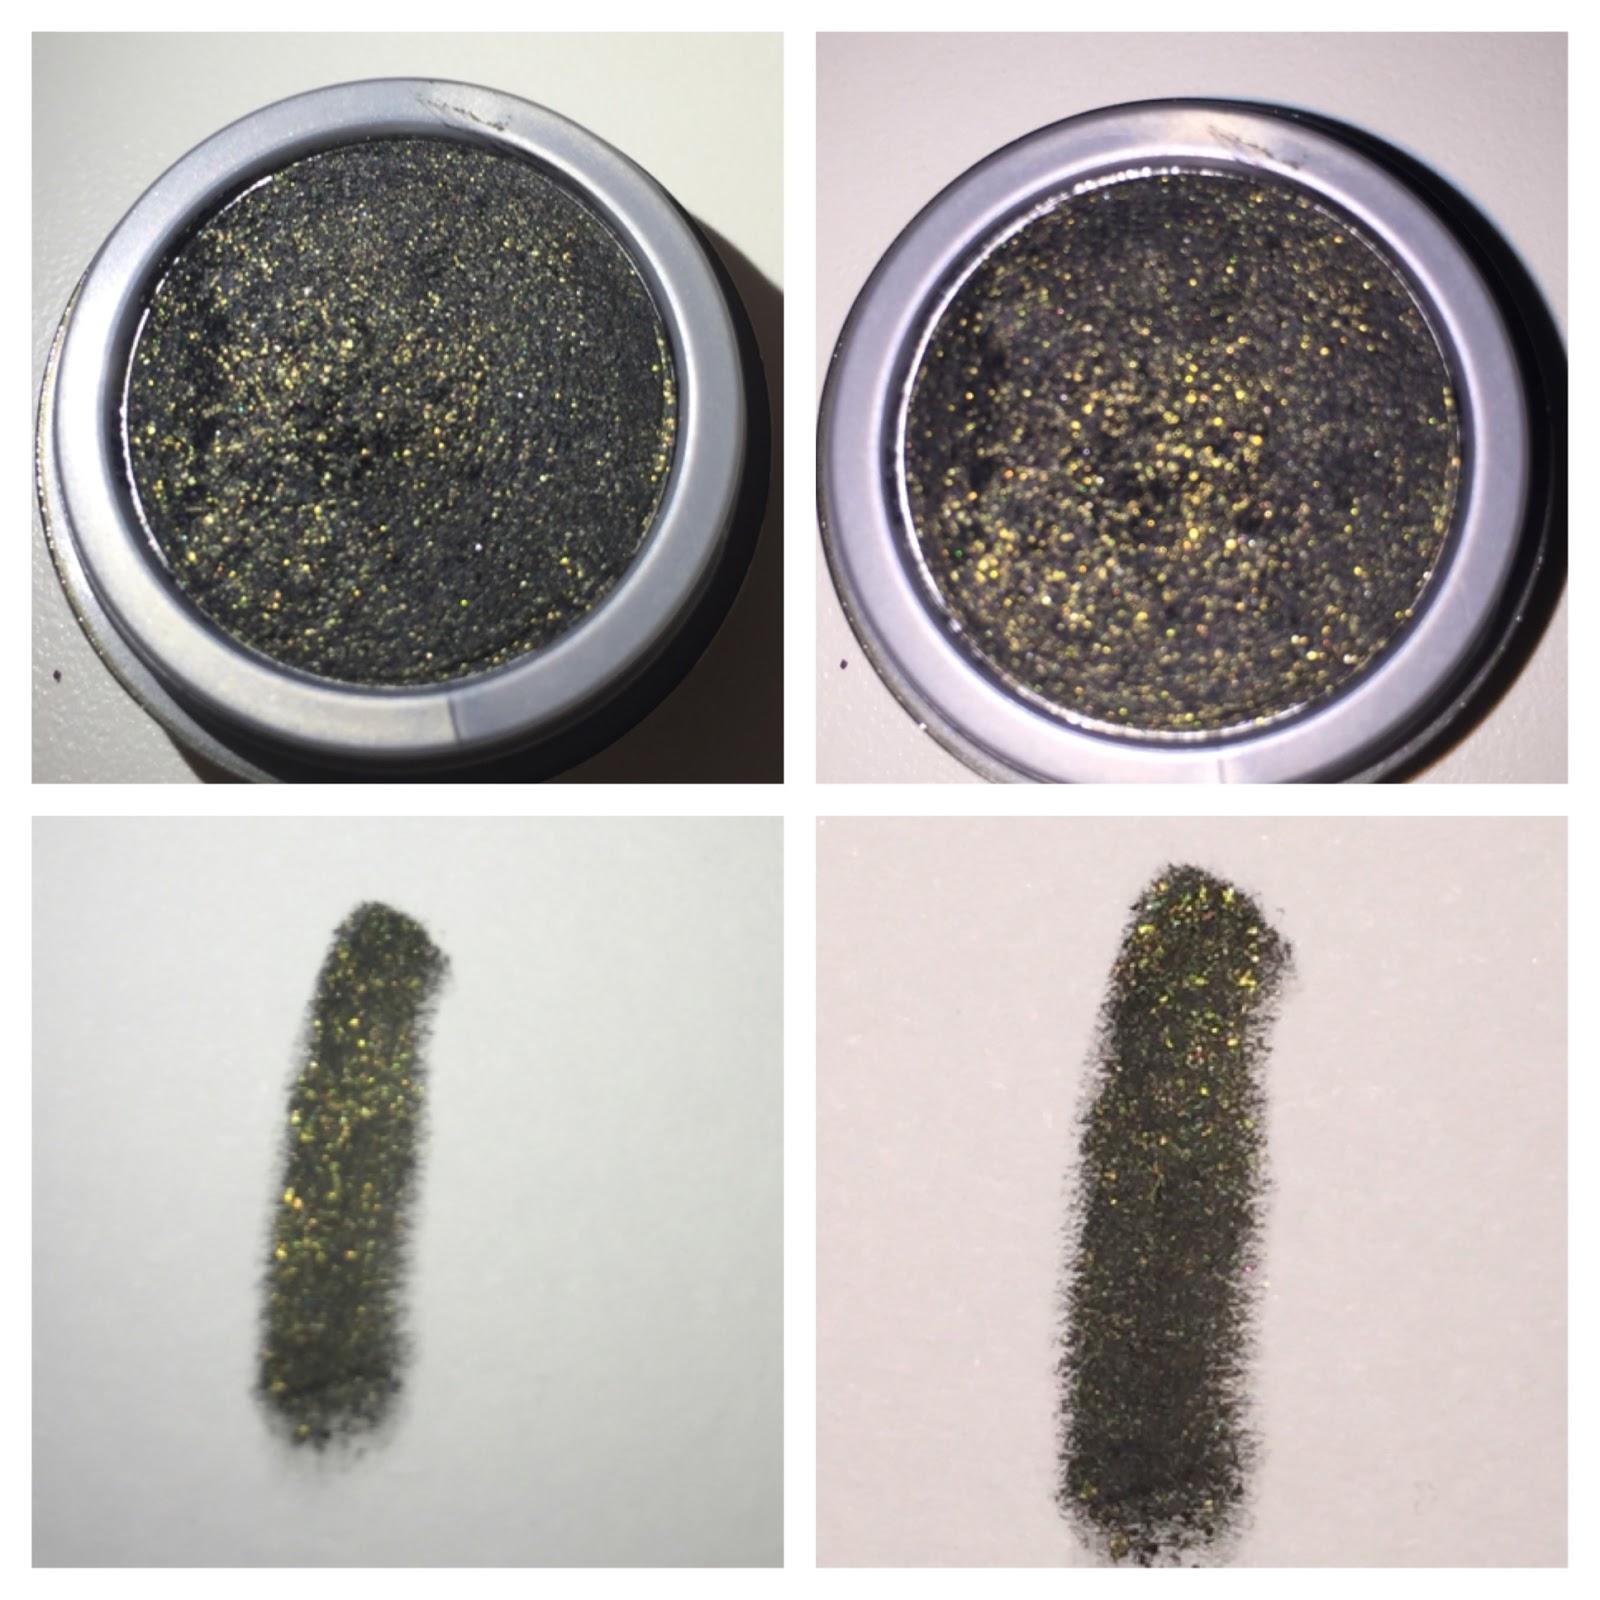 Milani Fierce Foil Eyeliner Review and swatch Black gold foil